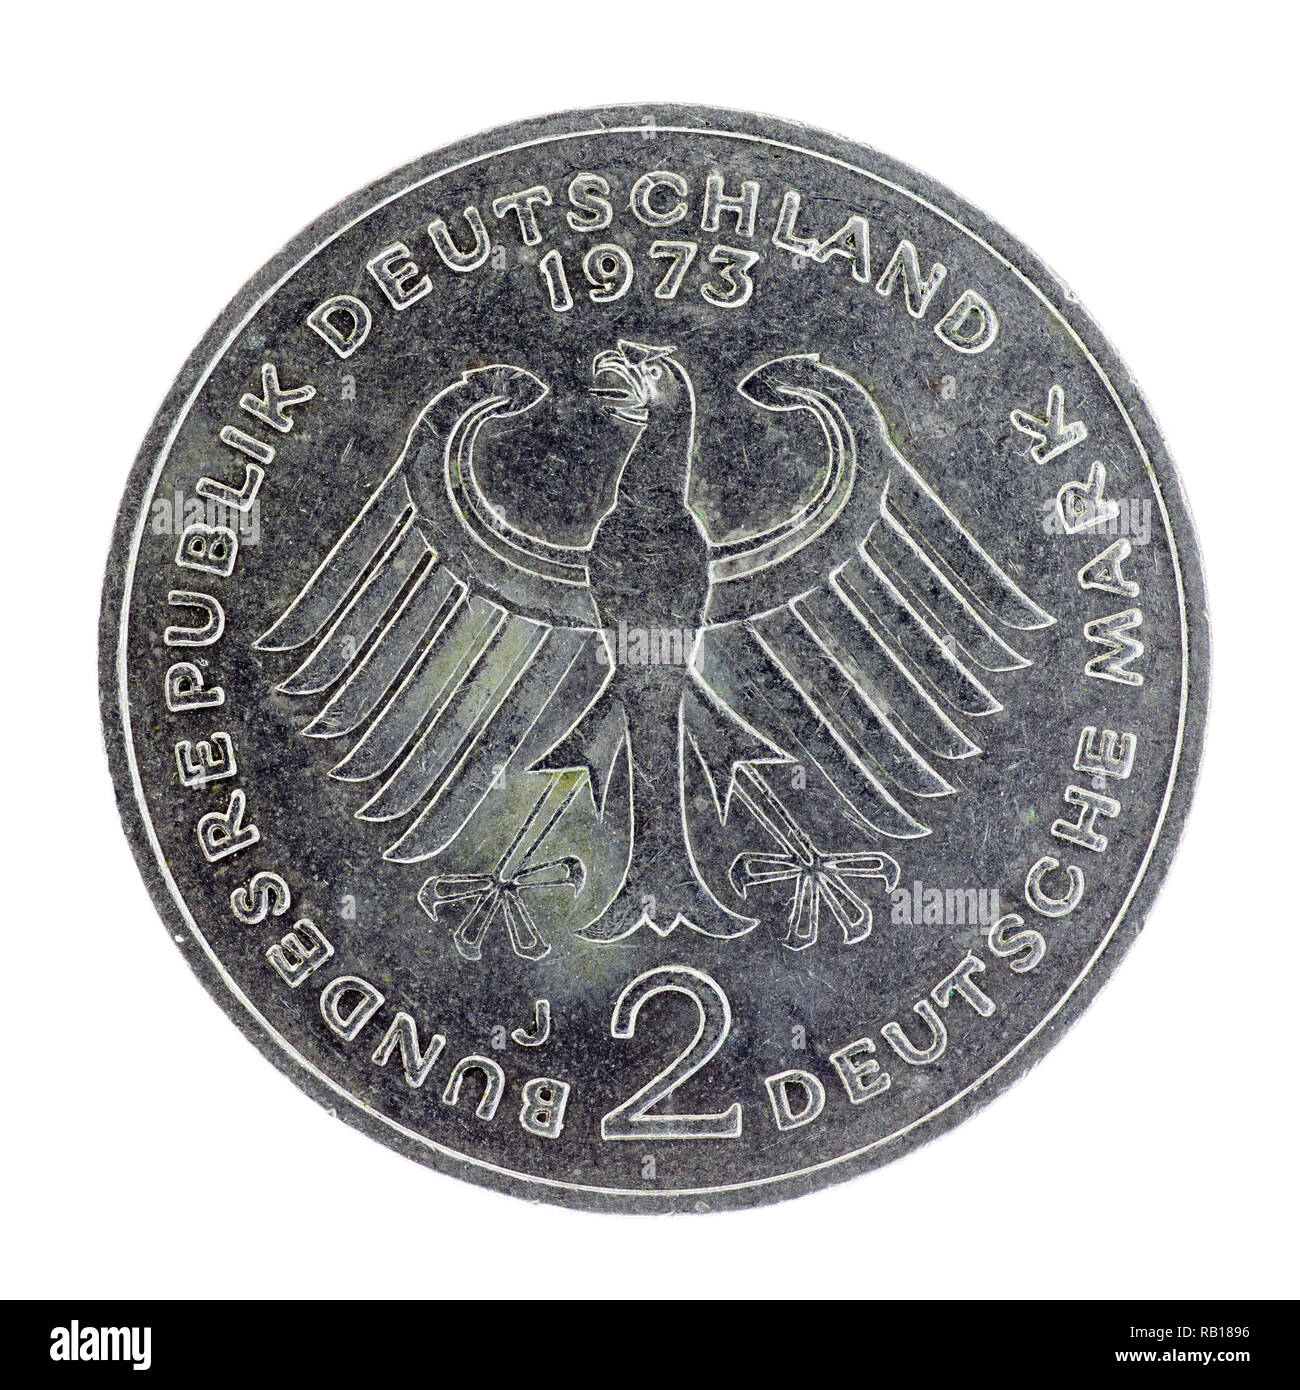 German pre-Euro 2 Deutschmark coin dated 1973 - Stock Image